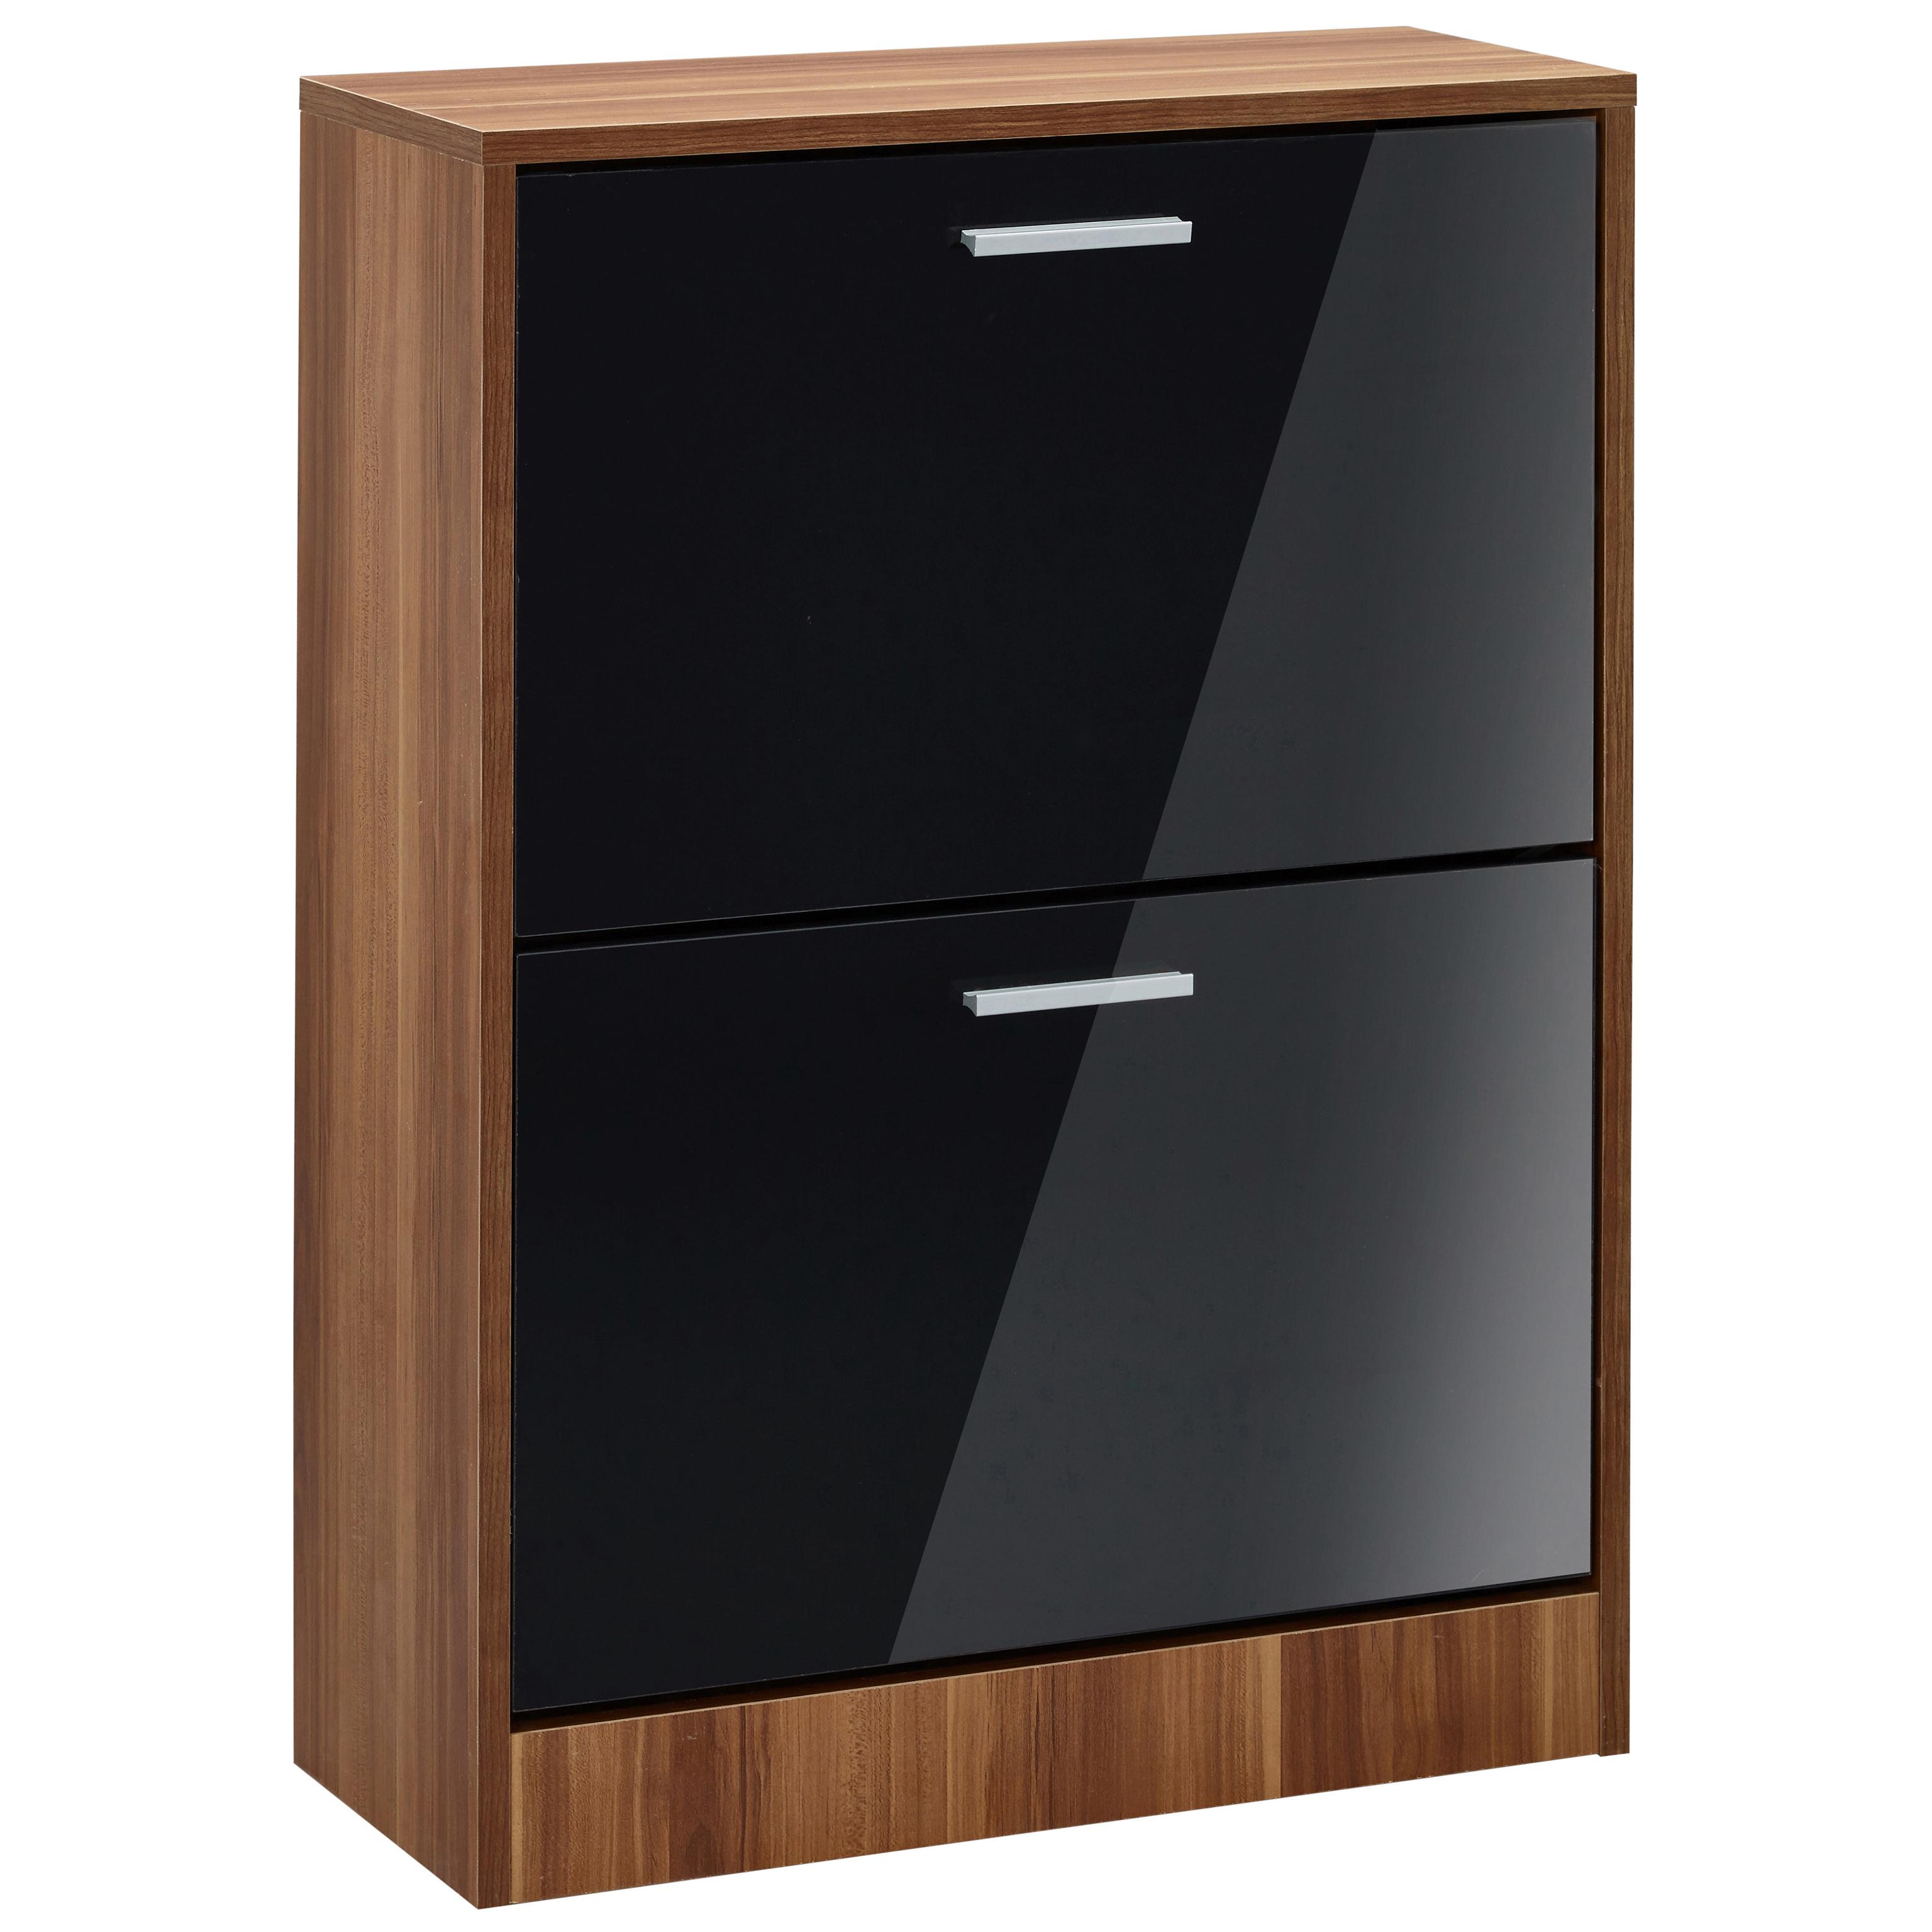 White Gloss Kitchen Cabinets Ebay: High Gloss & Walnut Finish Shoe Storage Cupboard Cabinet